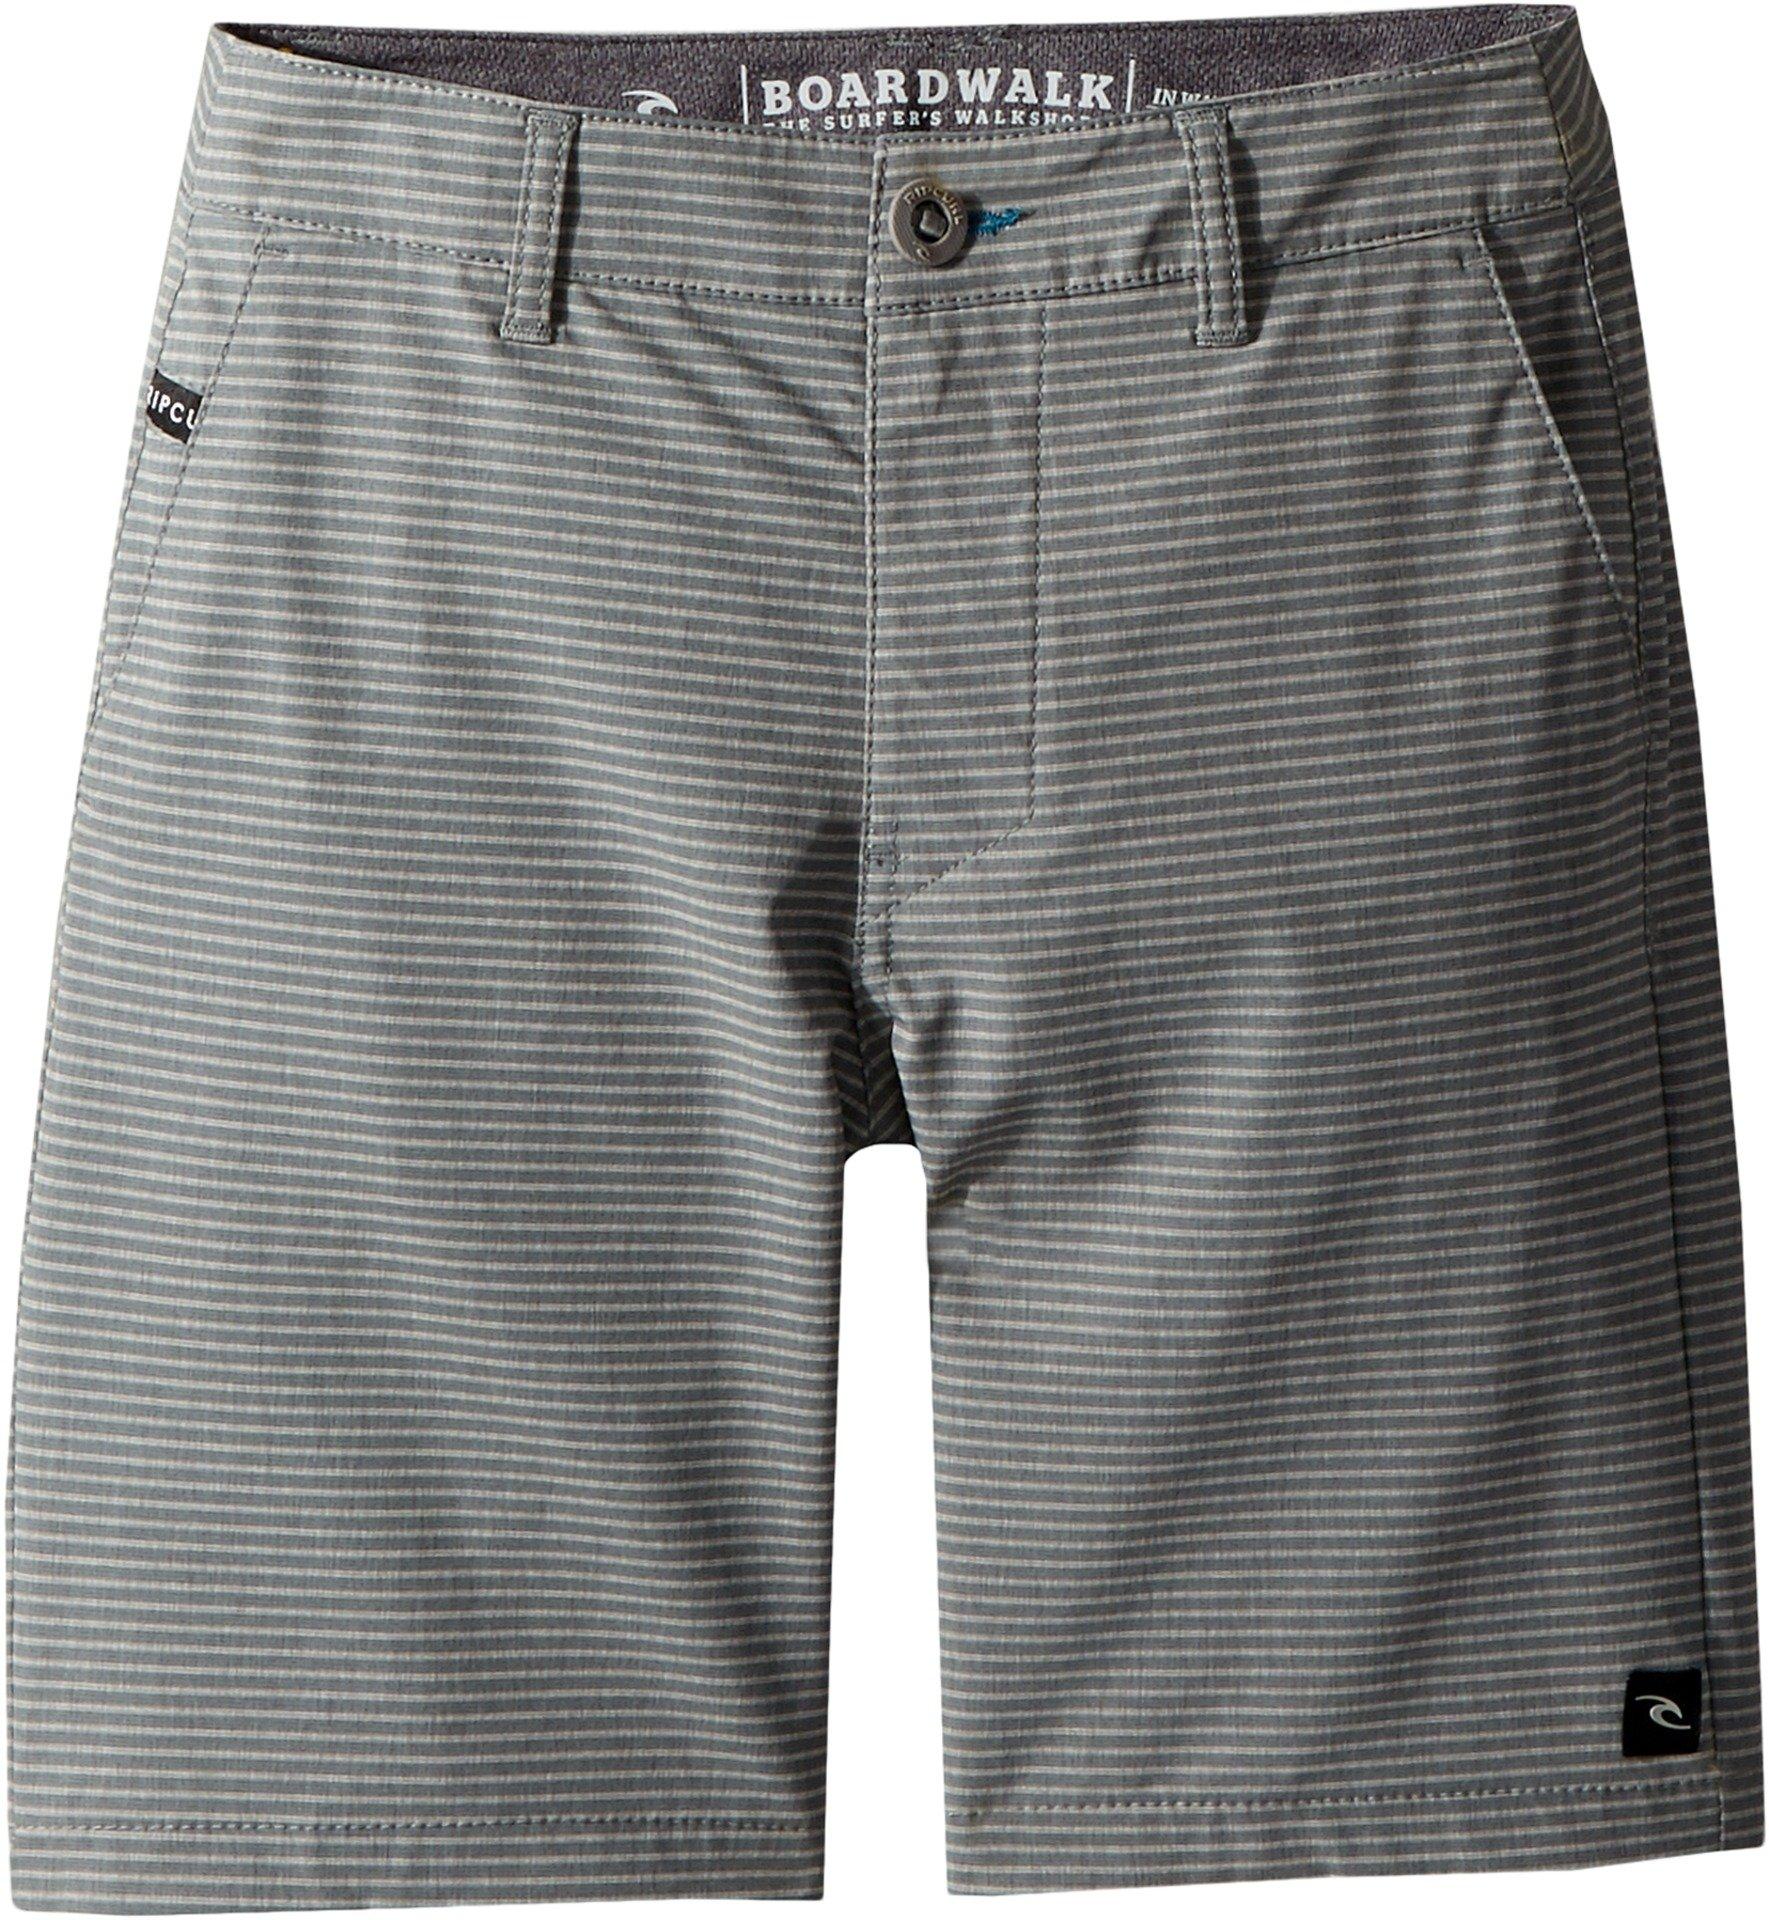 Rip Curl Kids Boy's Mirage Phase Boardwalk Shorts (Big Kids) Charcoal 25 (10 Big Kids)